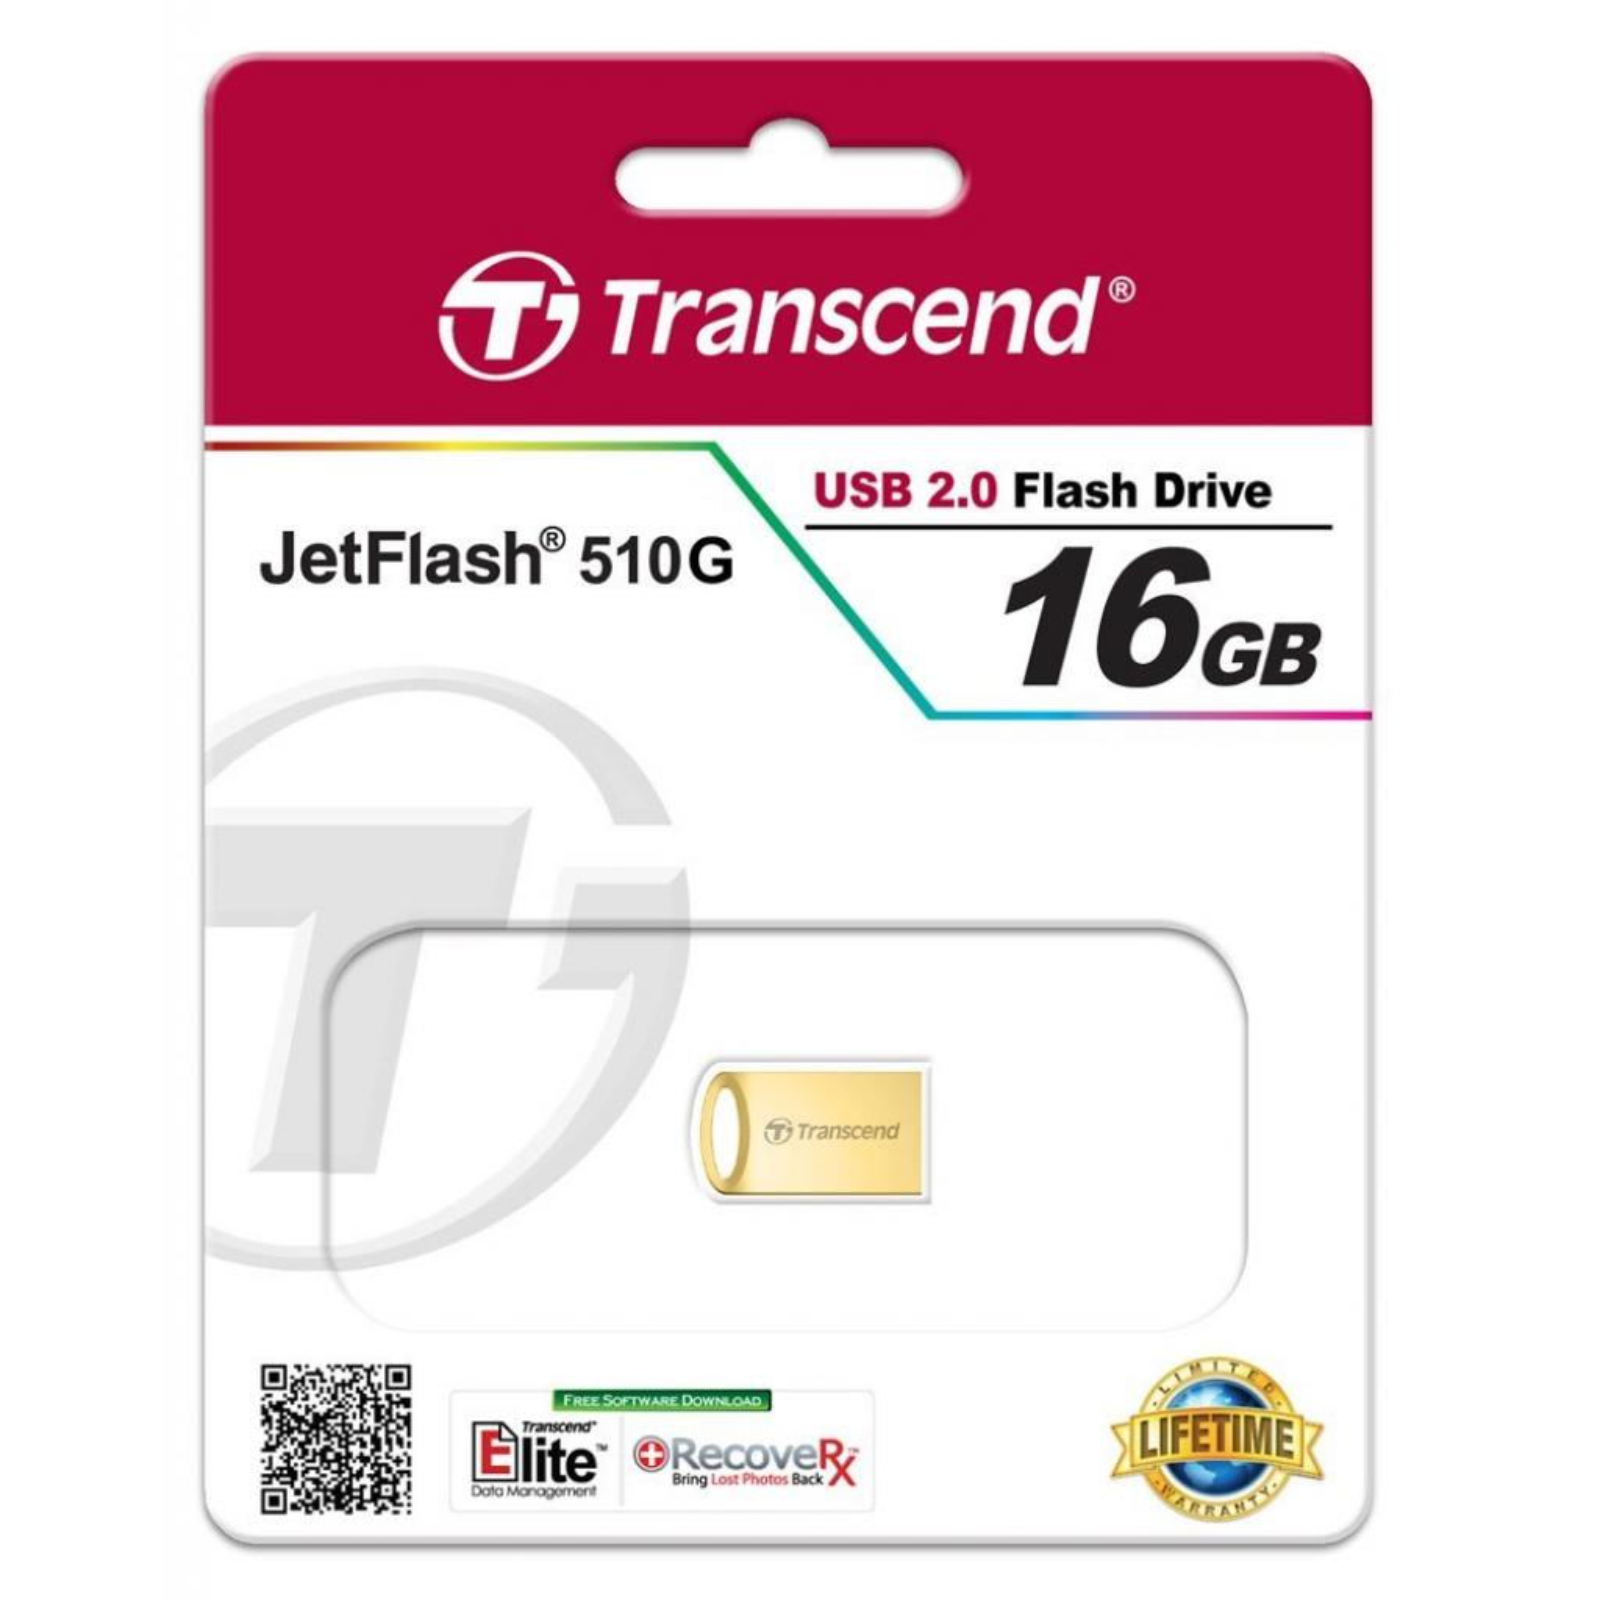 USB флеш накопитель Transcend JetFlash 510, Gold Plating (TS16GJF510G) изображение 4